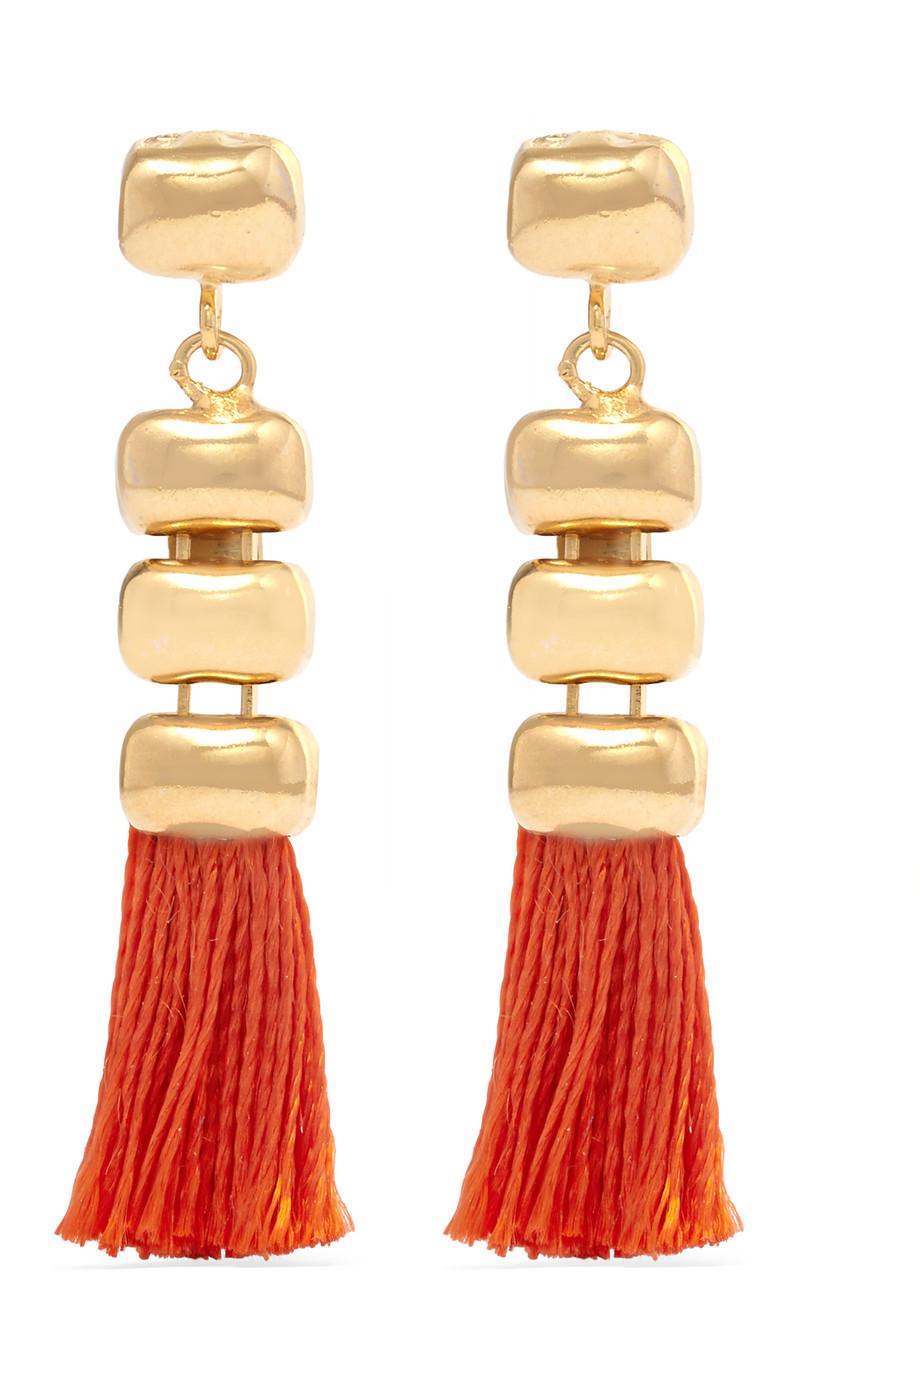 Rosantica Atena Tasseled Gold-Tone Earrings, Orange/Gold, Women's